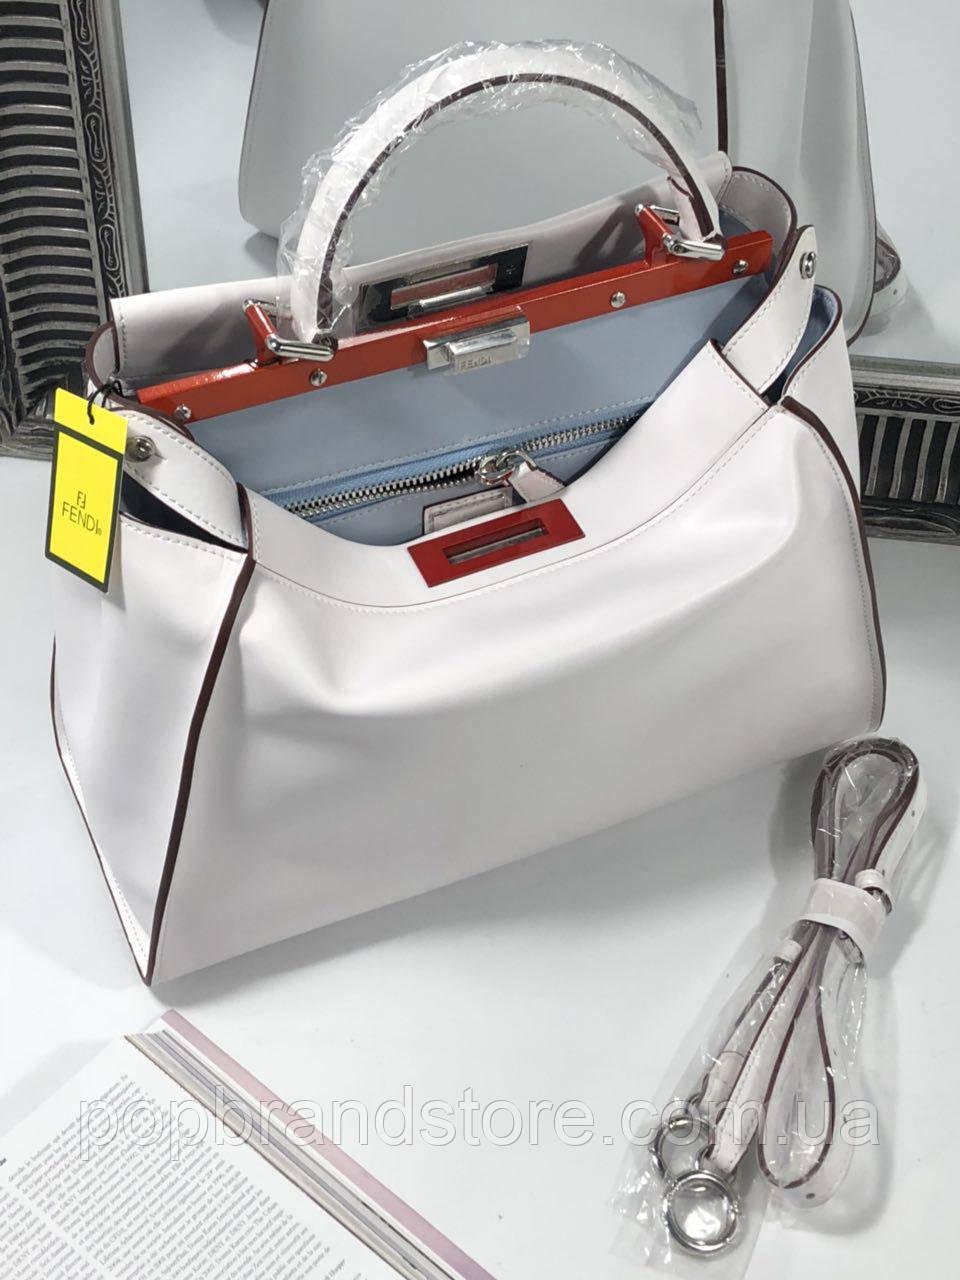 5b5ec93fdfa3 Стильная женская сумка FENDI PEEKABOO 33 см (реплика): продажа, цена ...